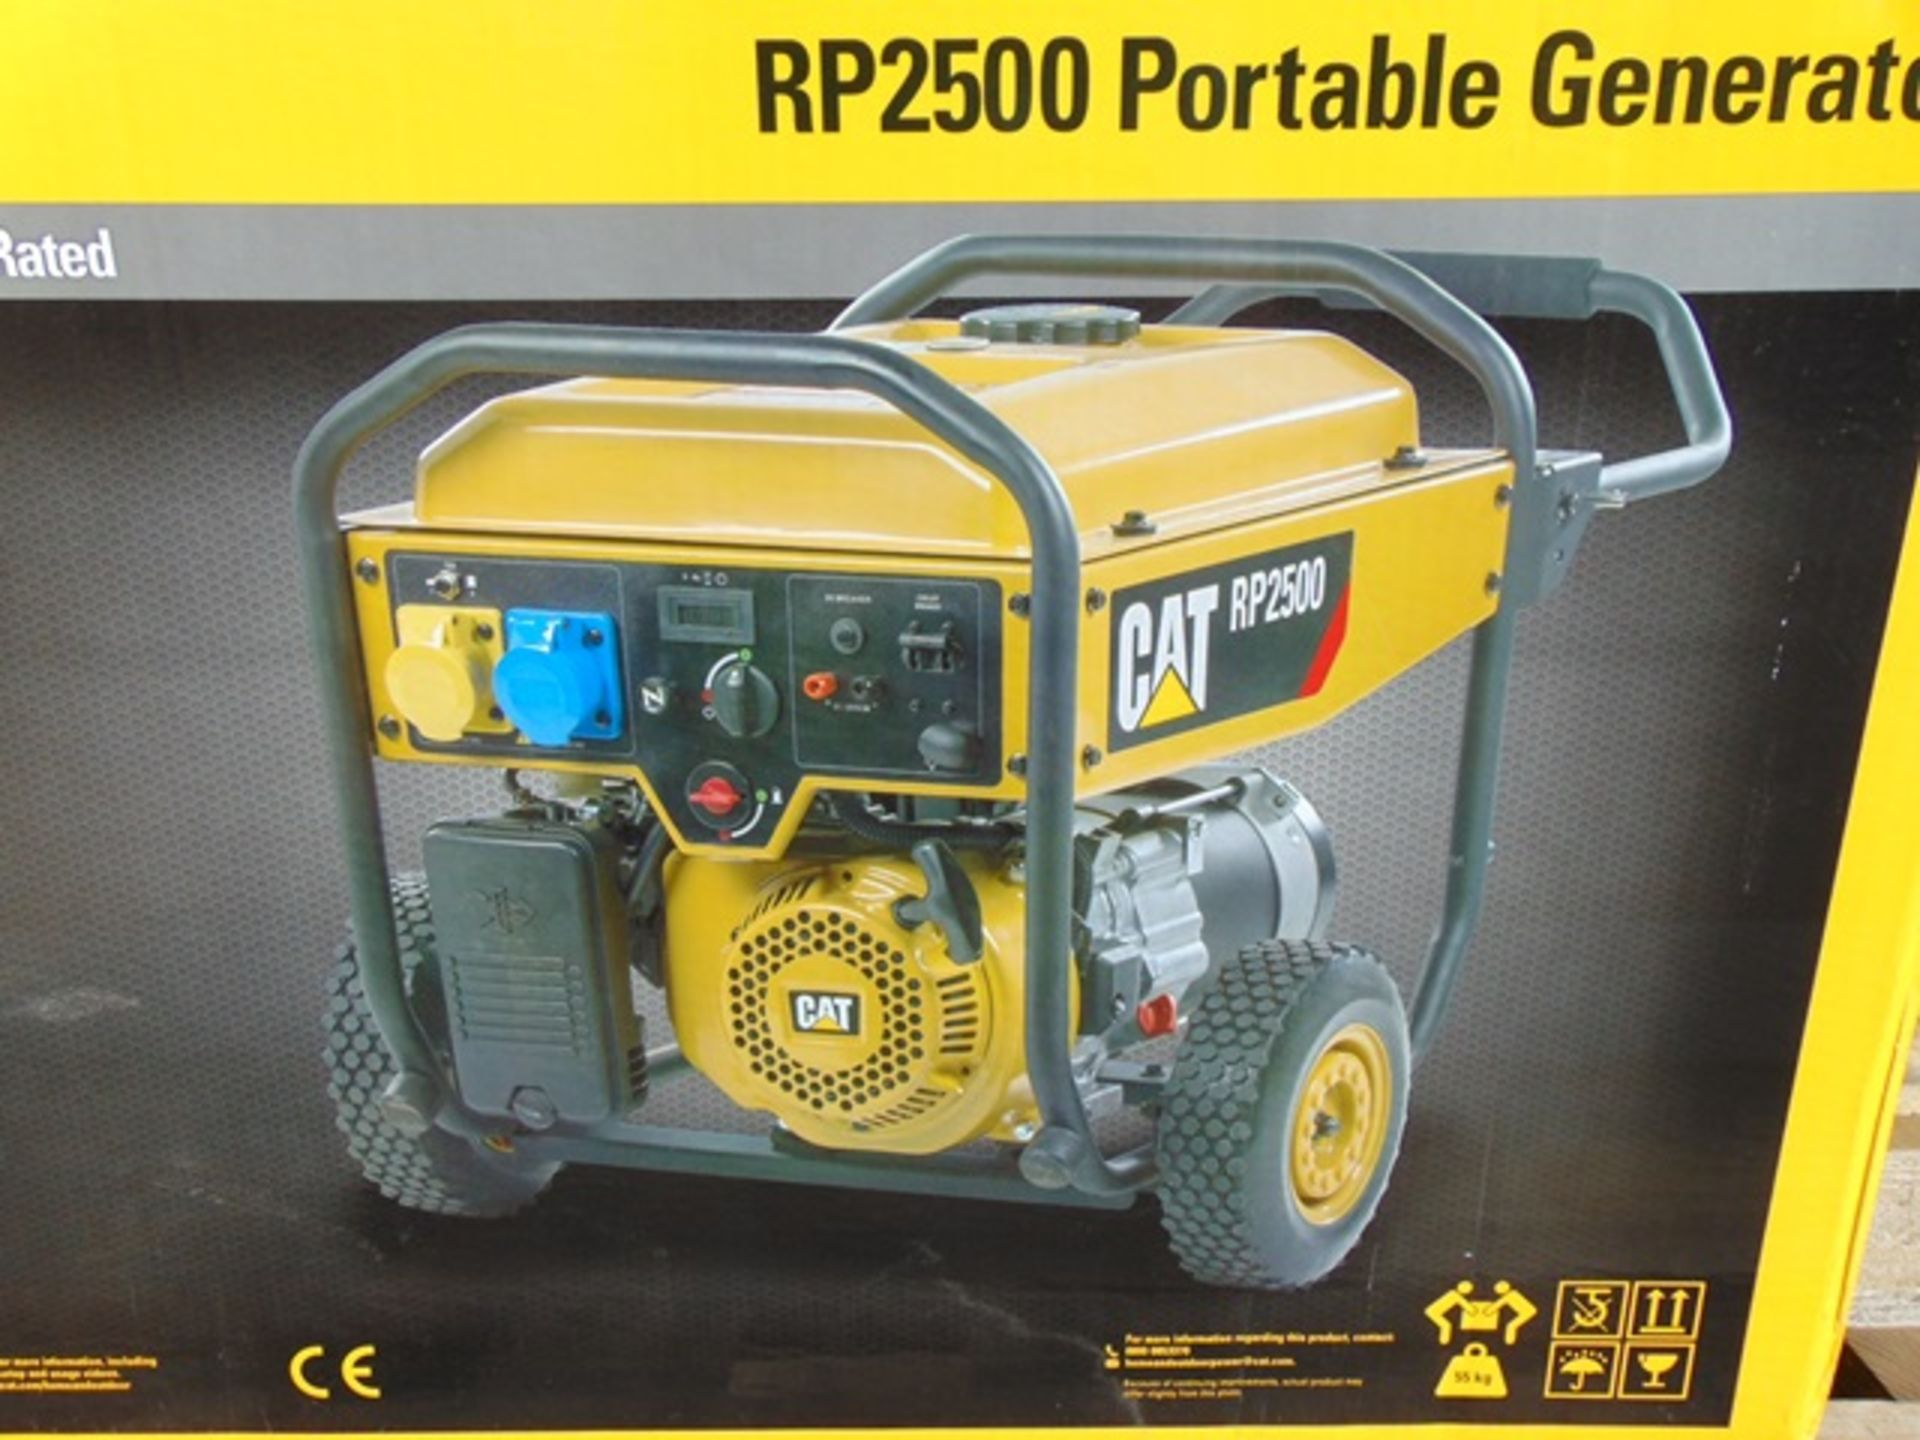 Lot 19 - UNISSUED Caterpillar RP2500 Industrial Petrol Generator Set